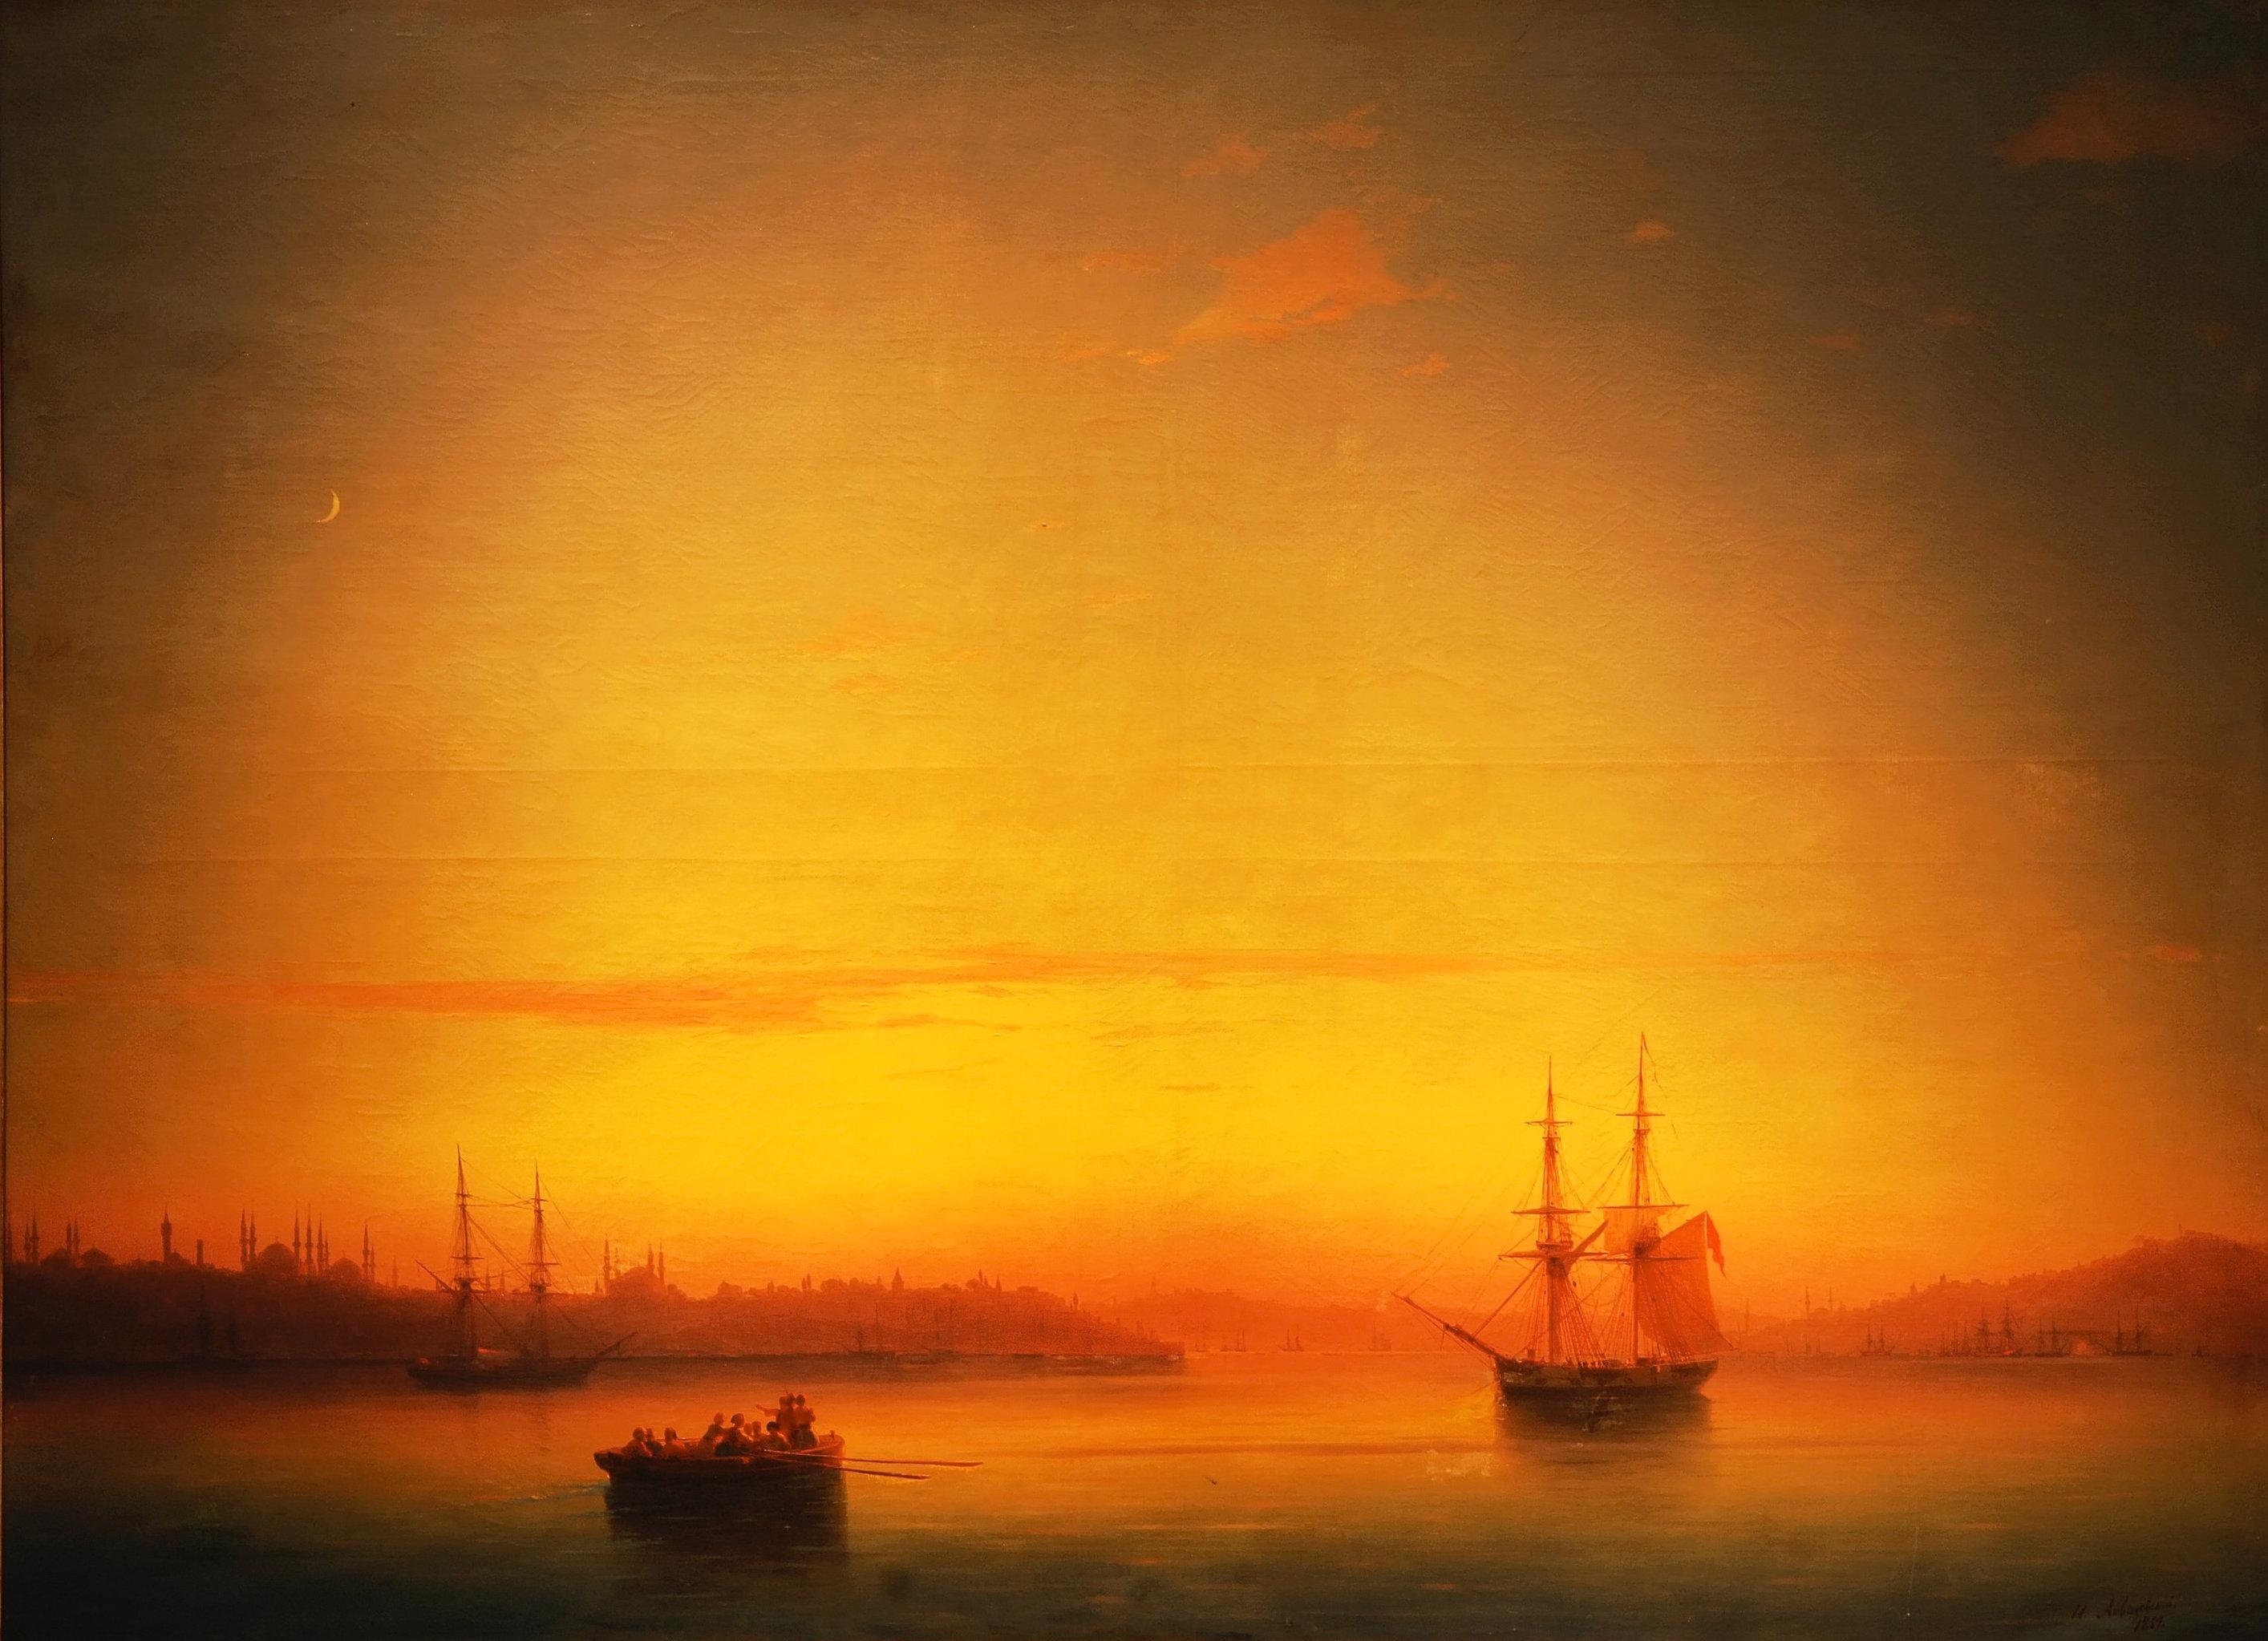 Iván Aivazovski - Constantinopla al atardecer